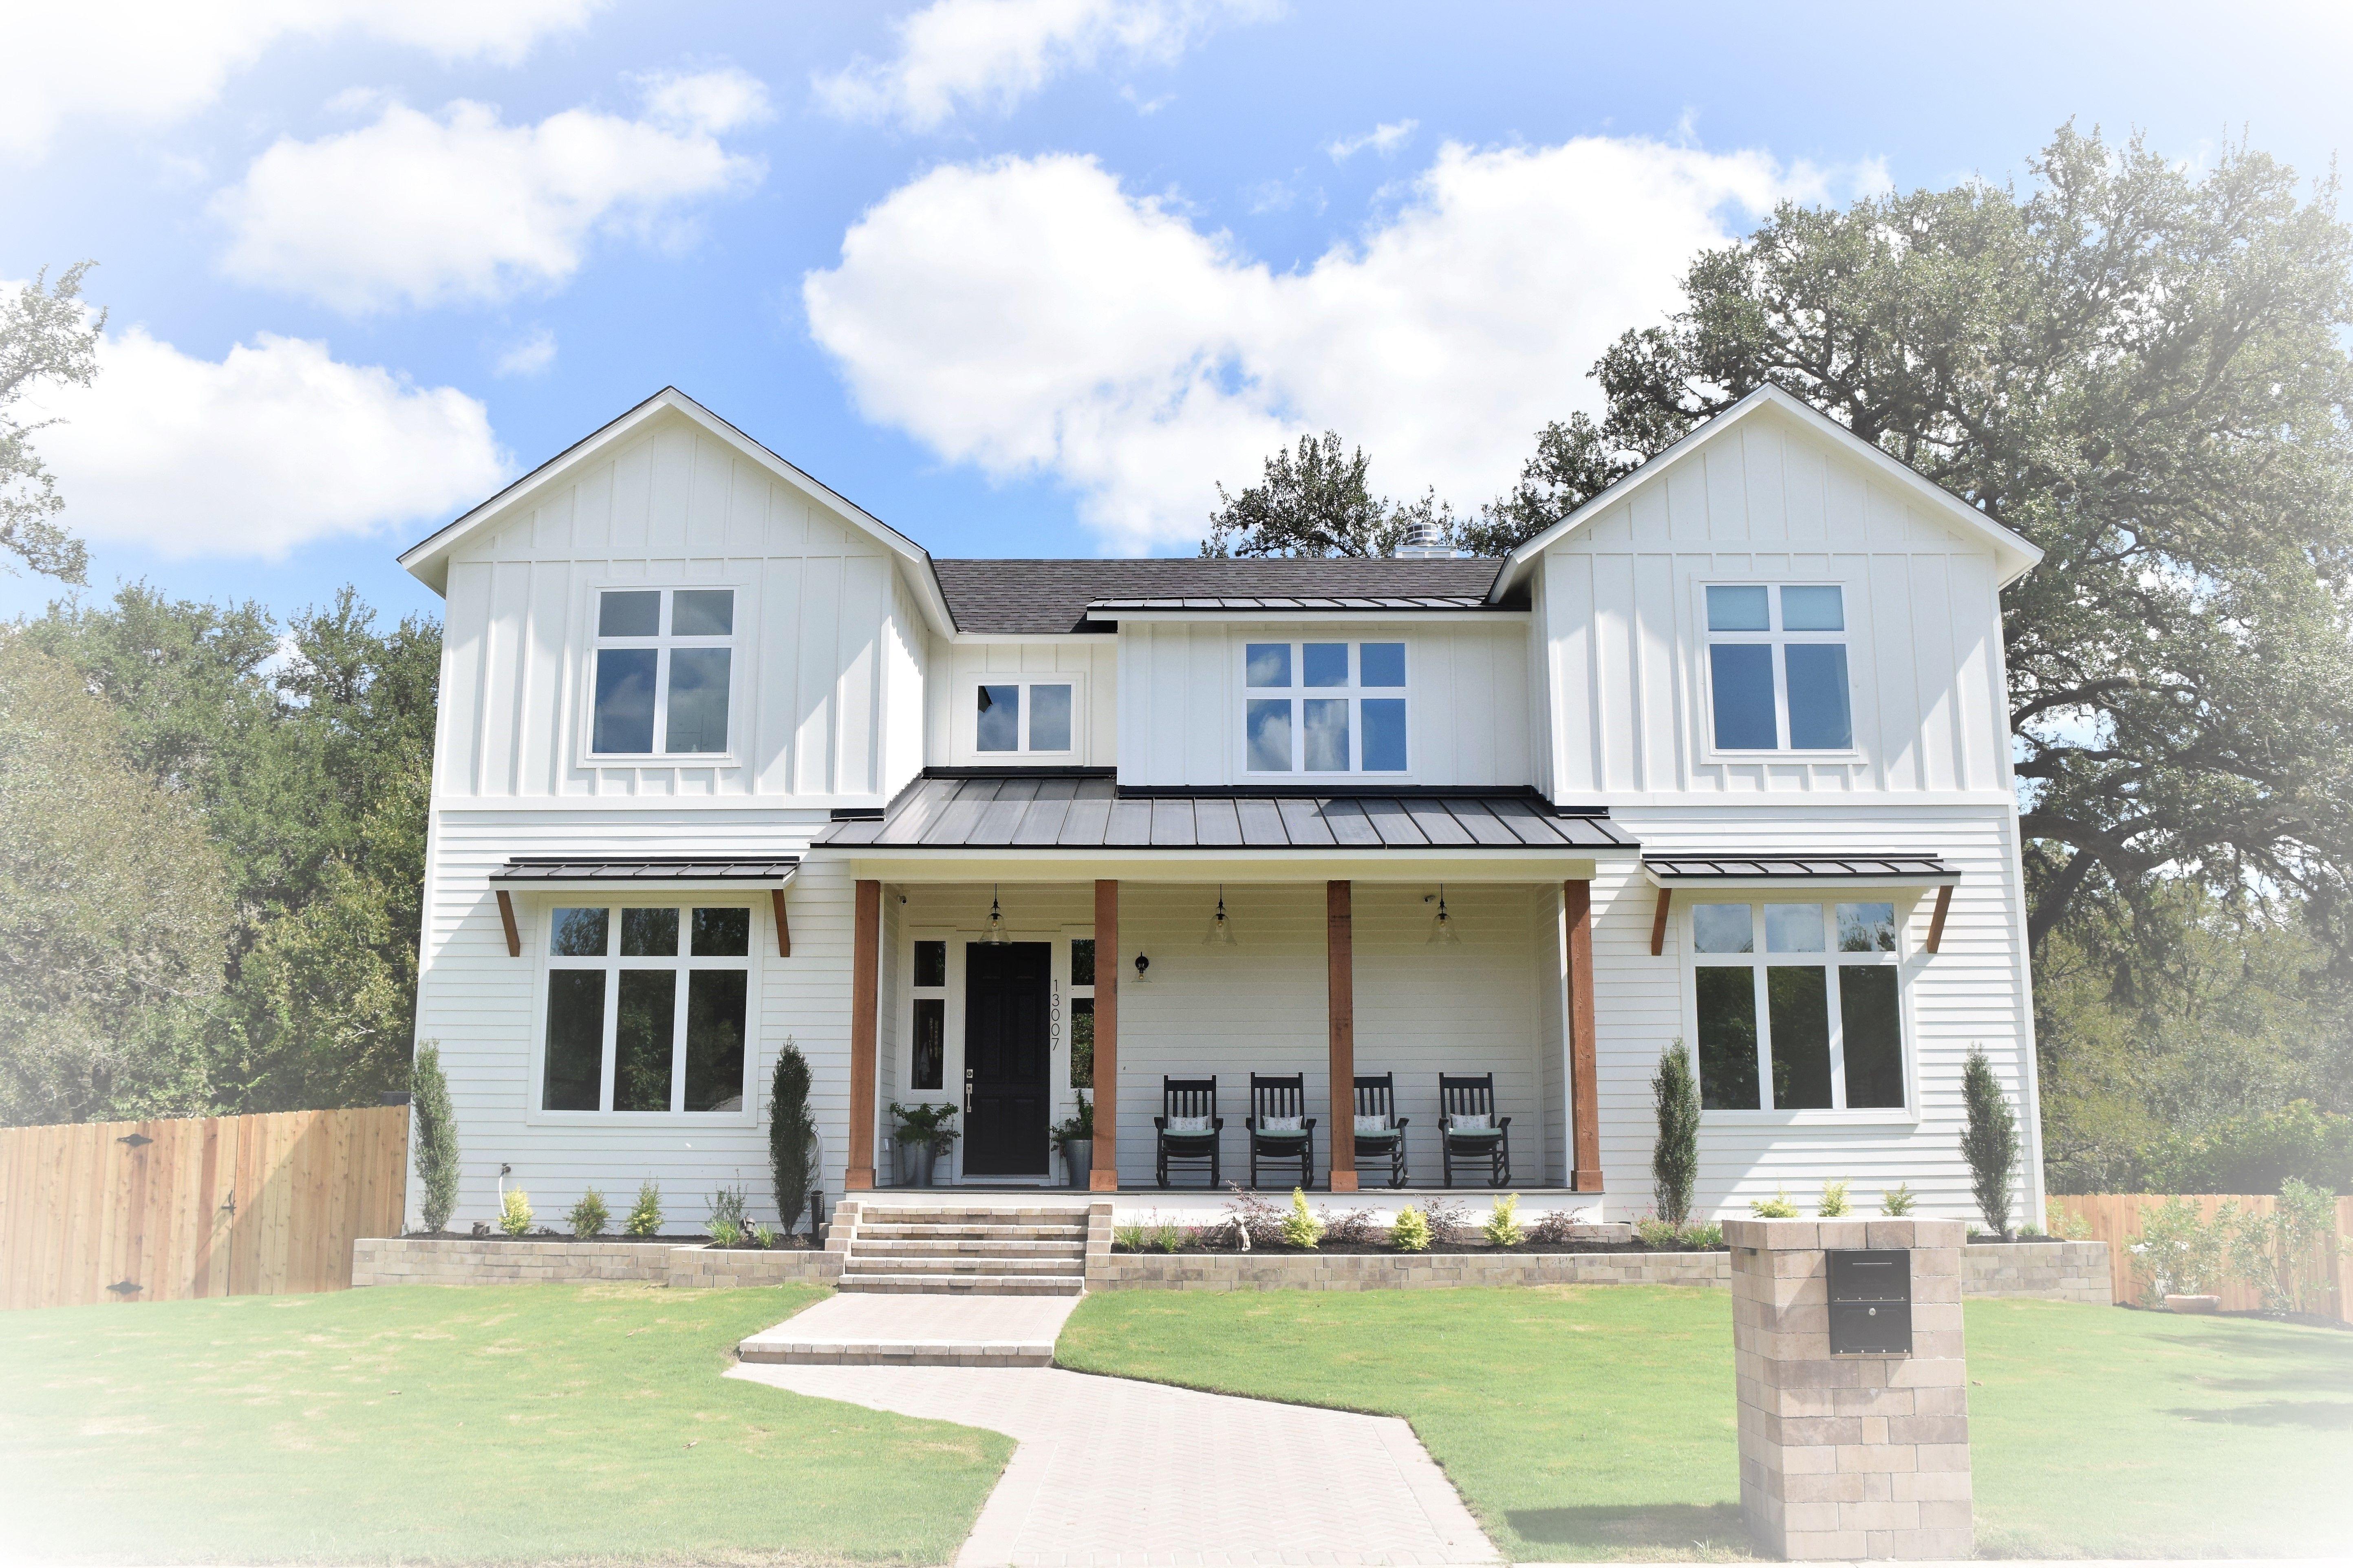 Best Modern Farmhouse Exterior Simply White Siding Black 400 x 300